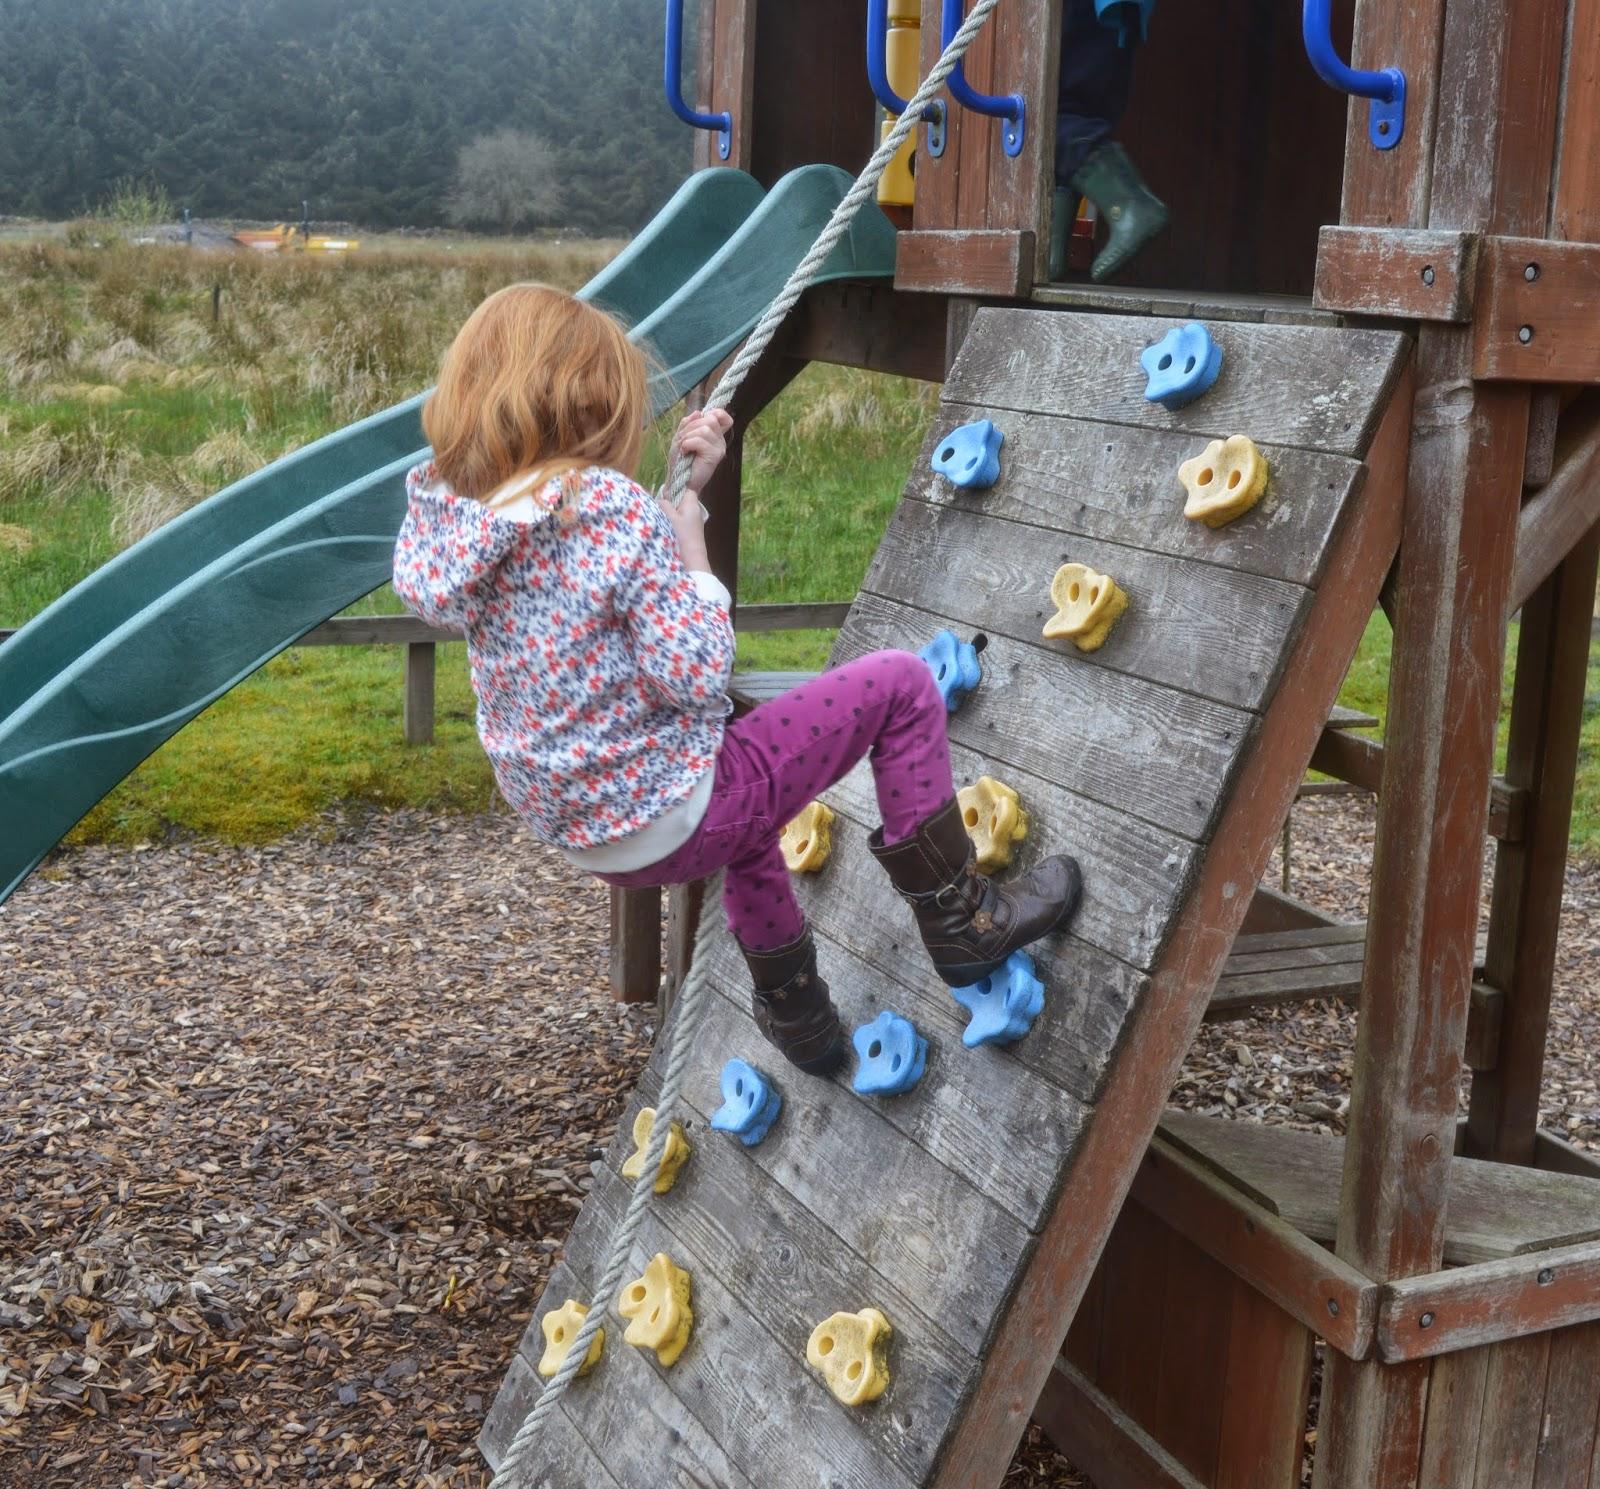 Children's play area at the Calvert Trust, Kielder